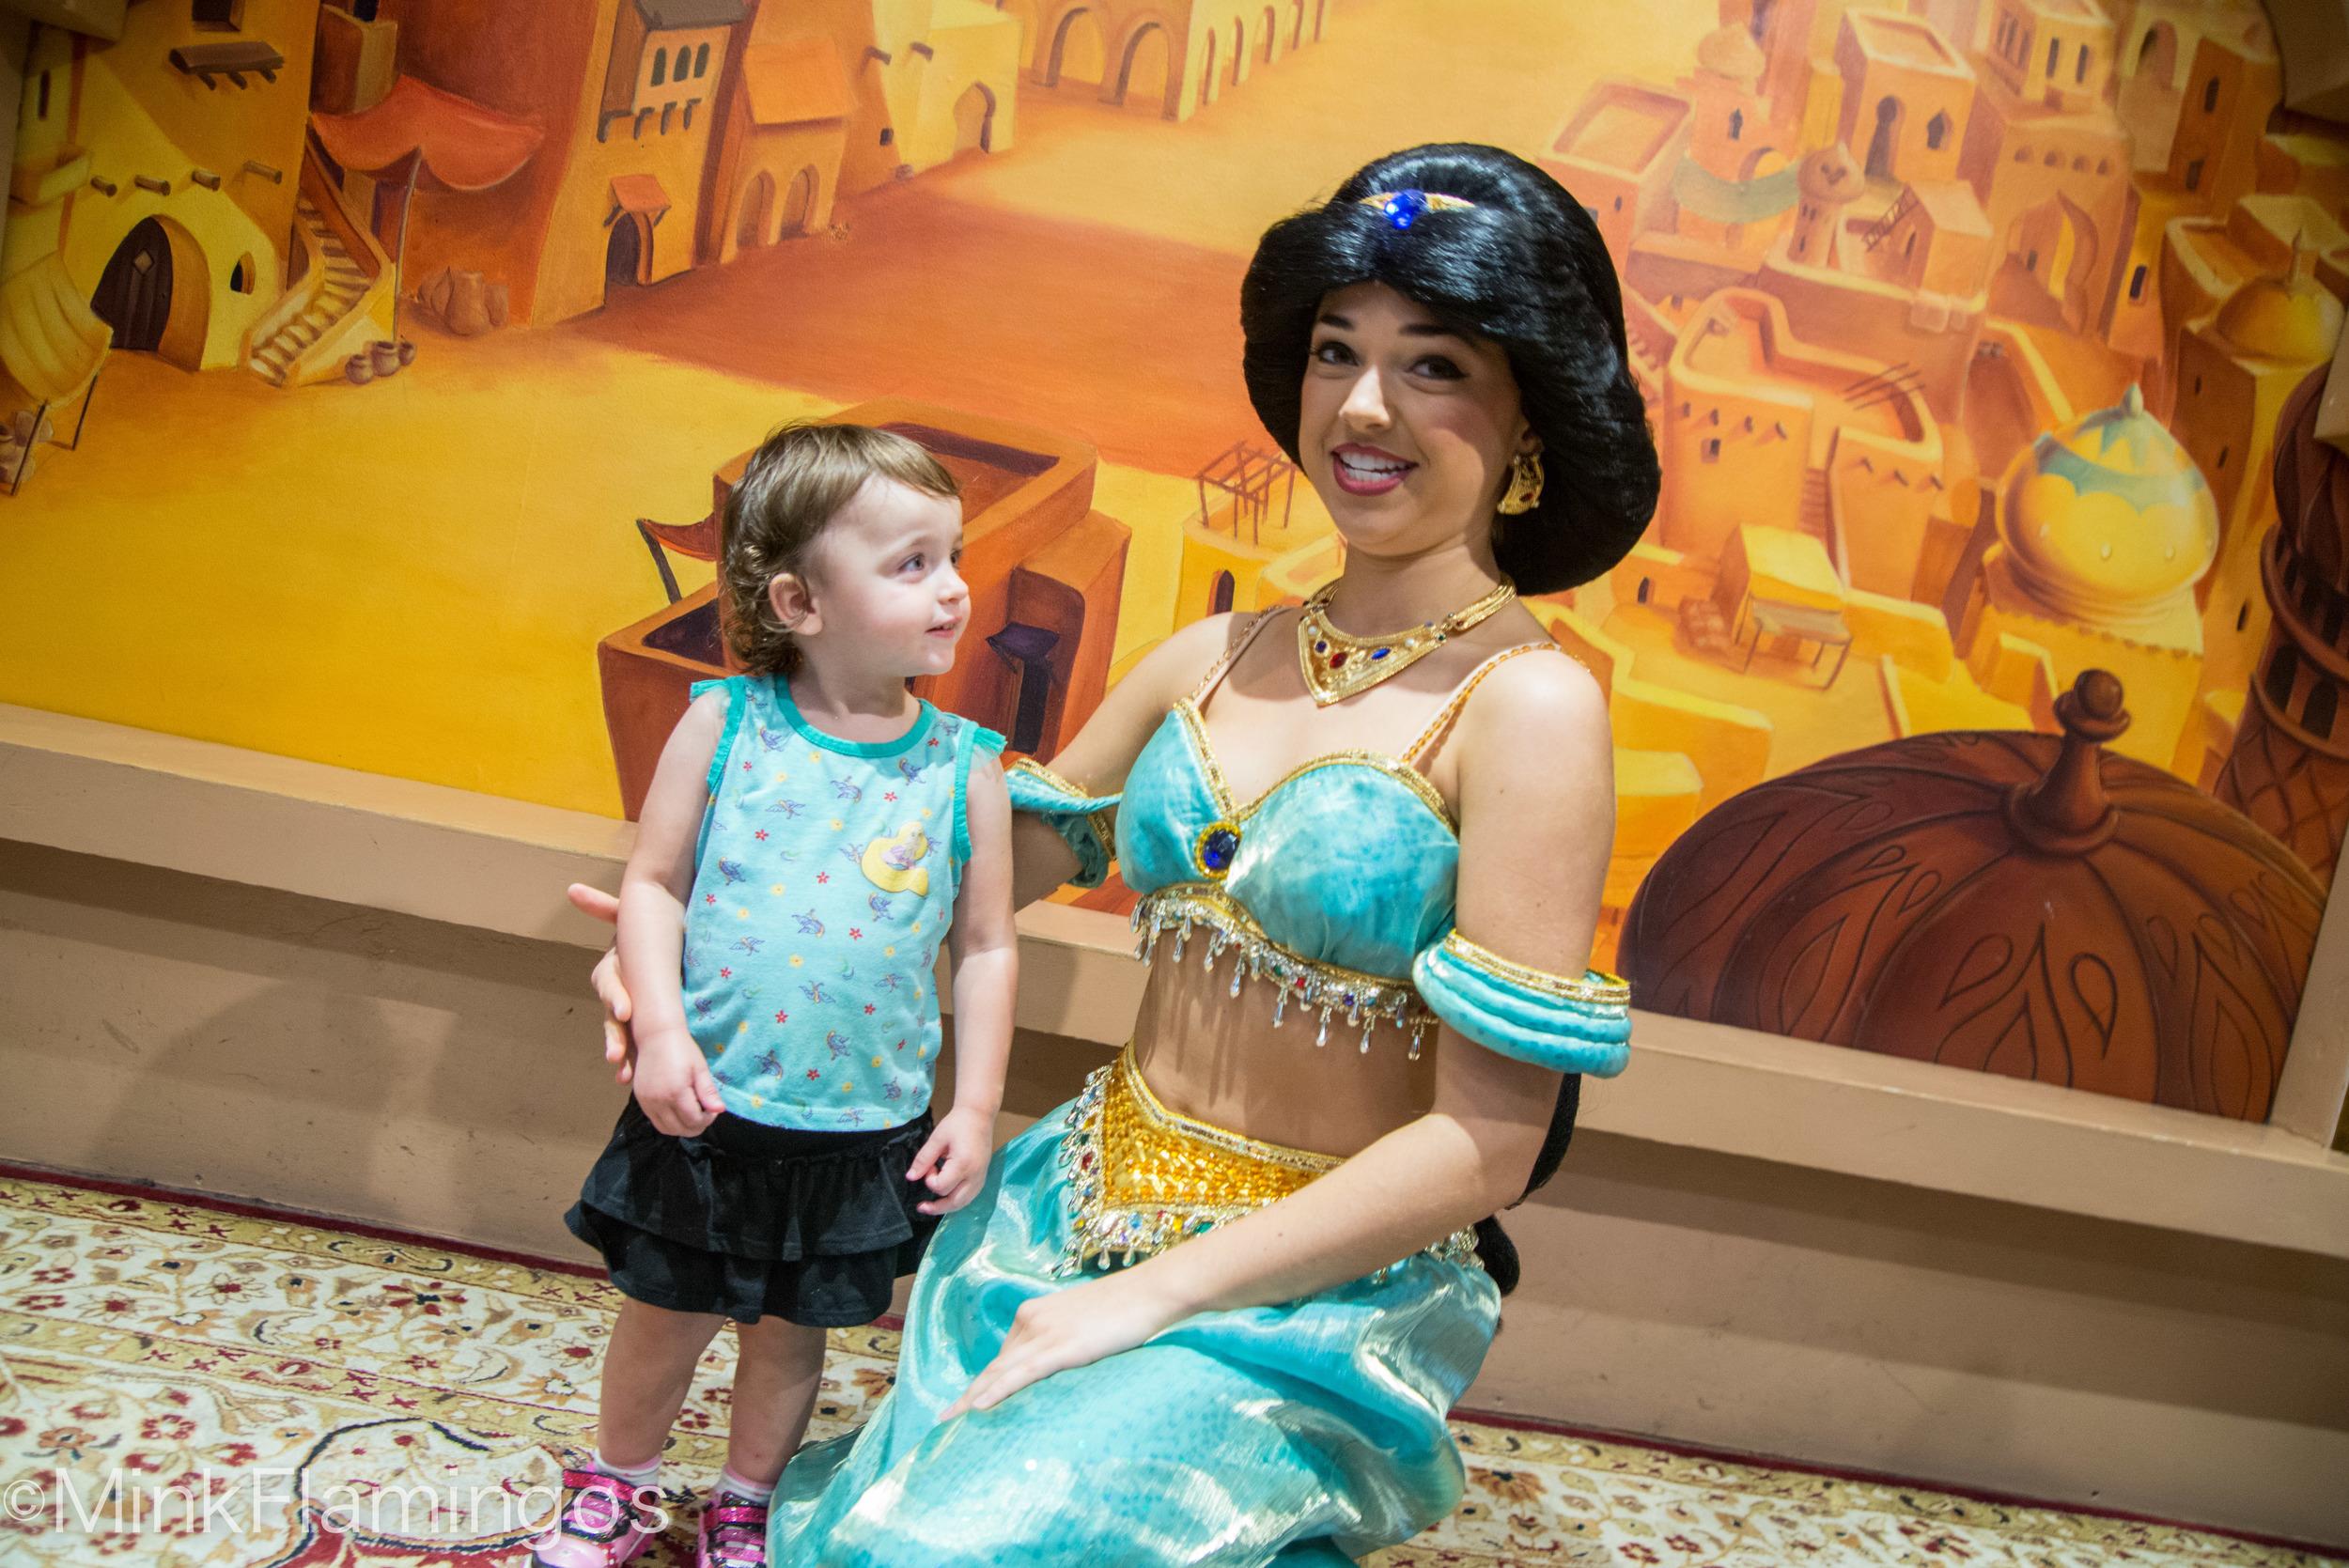 D's very impressed with Jasmine's sparkle